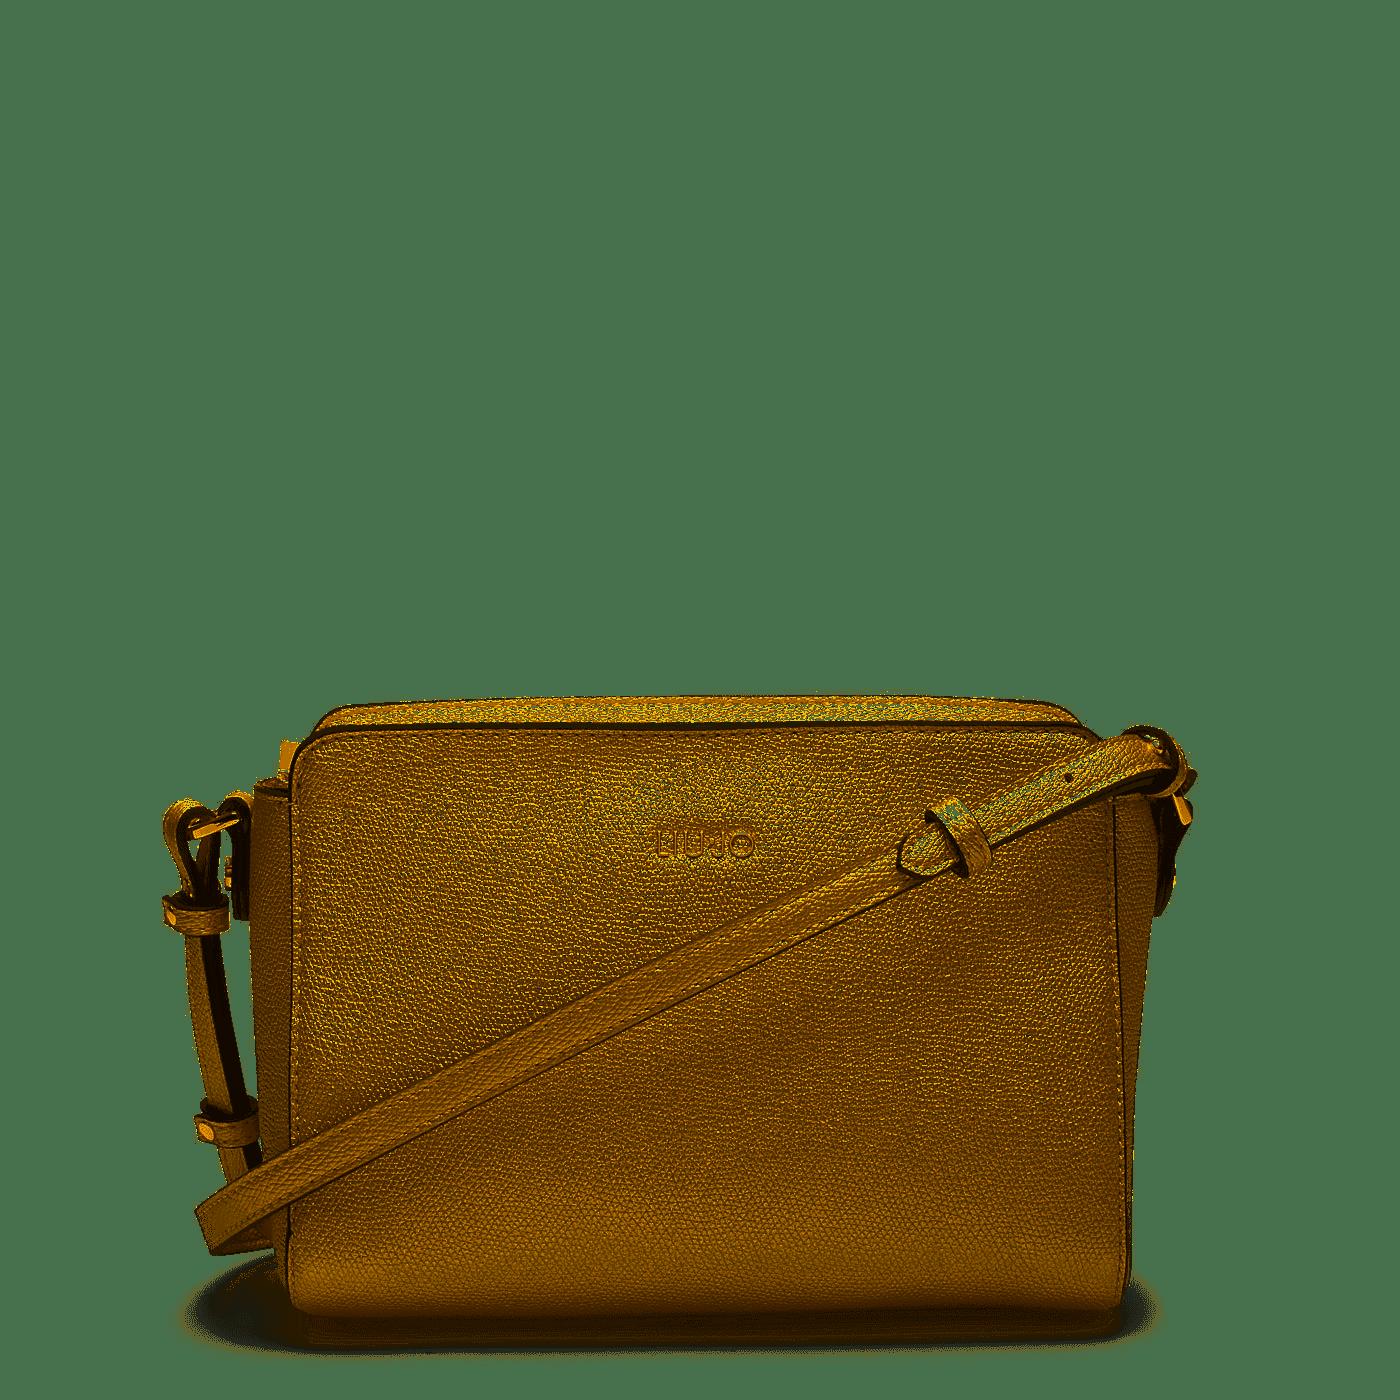 Tracolla S Crossbody gold - LIU JO